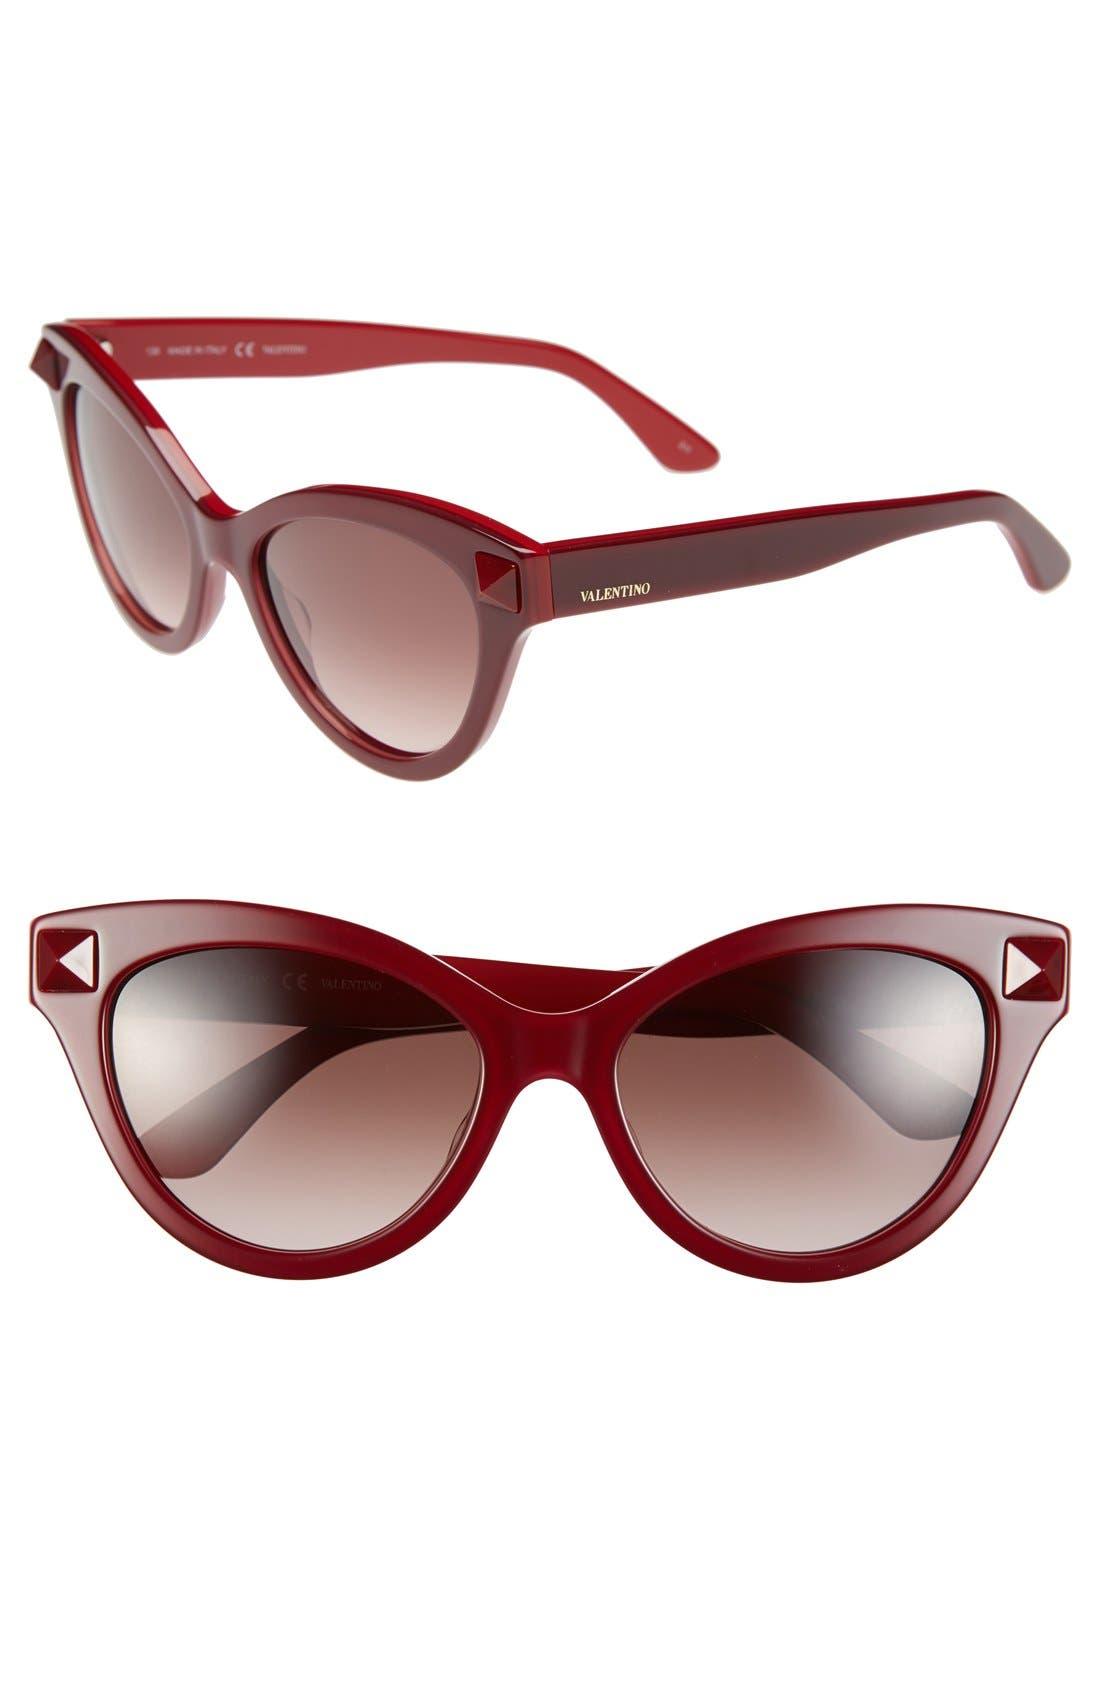 Main Image - Valentino 'Rockstud' 53mm Cat Eye Sunglasses